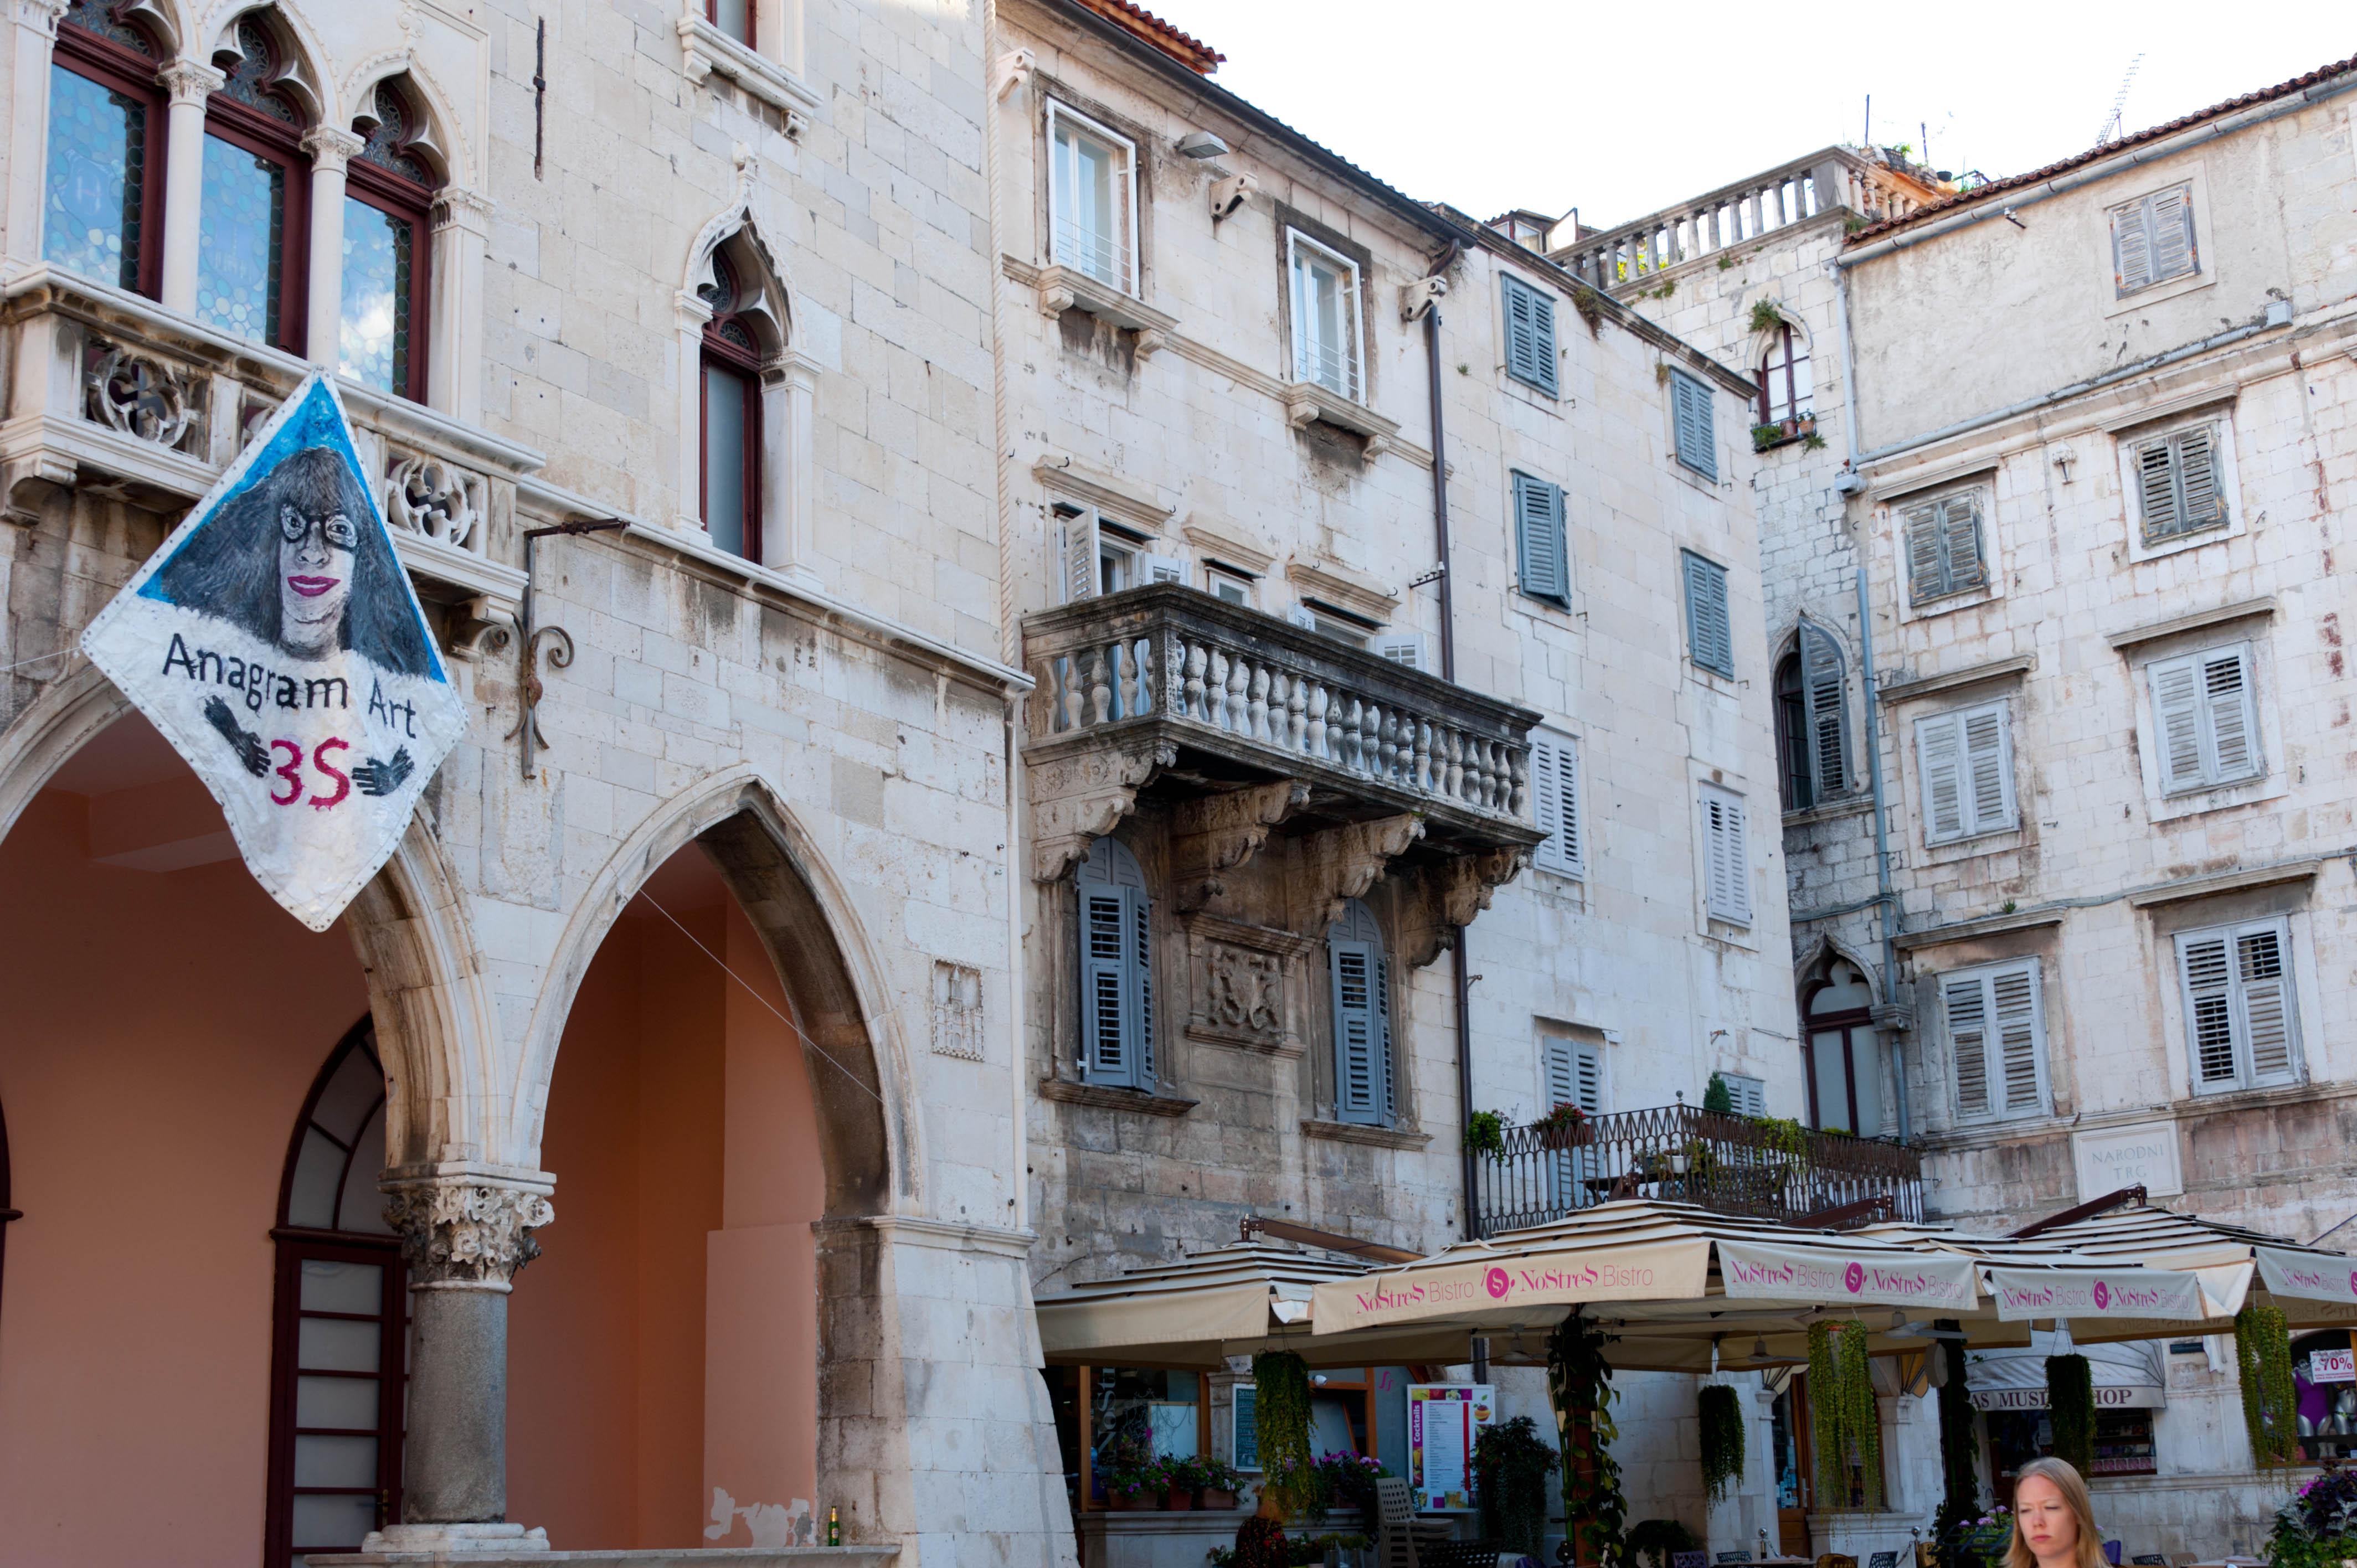 9800-Split (Dalmatie centrale)